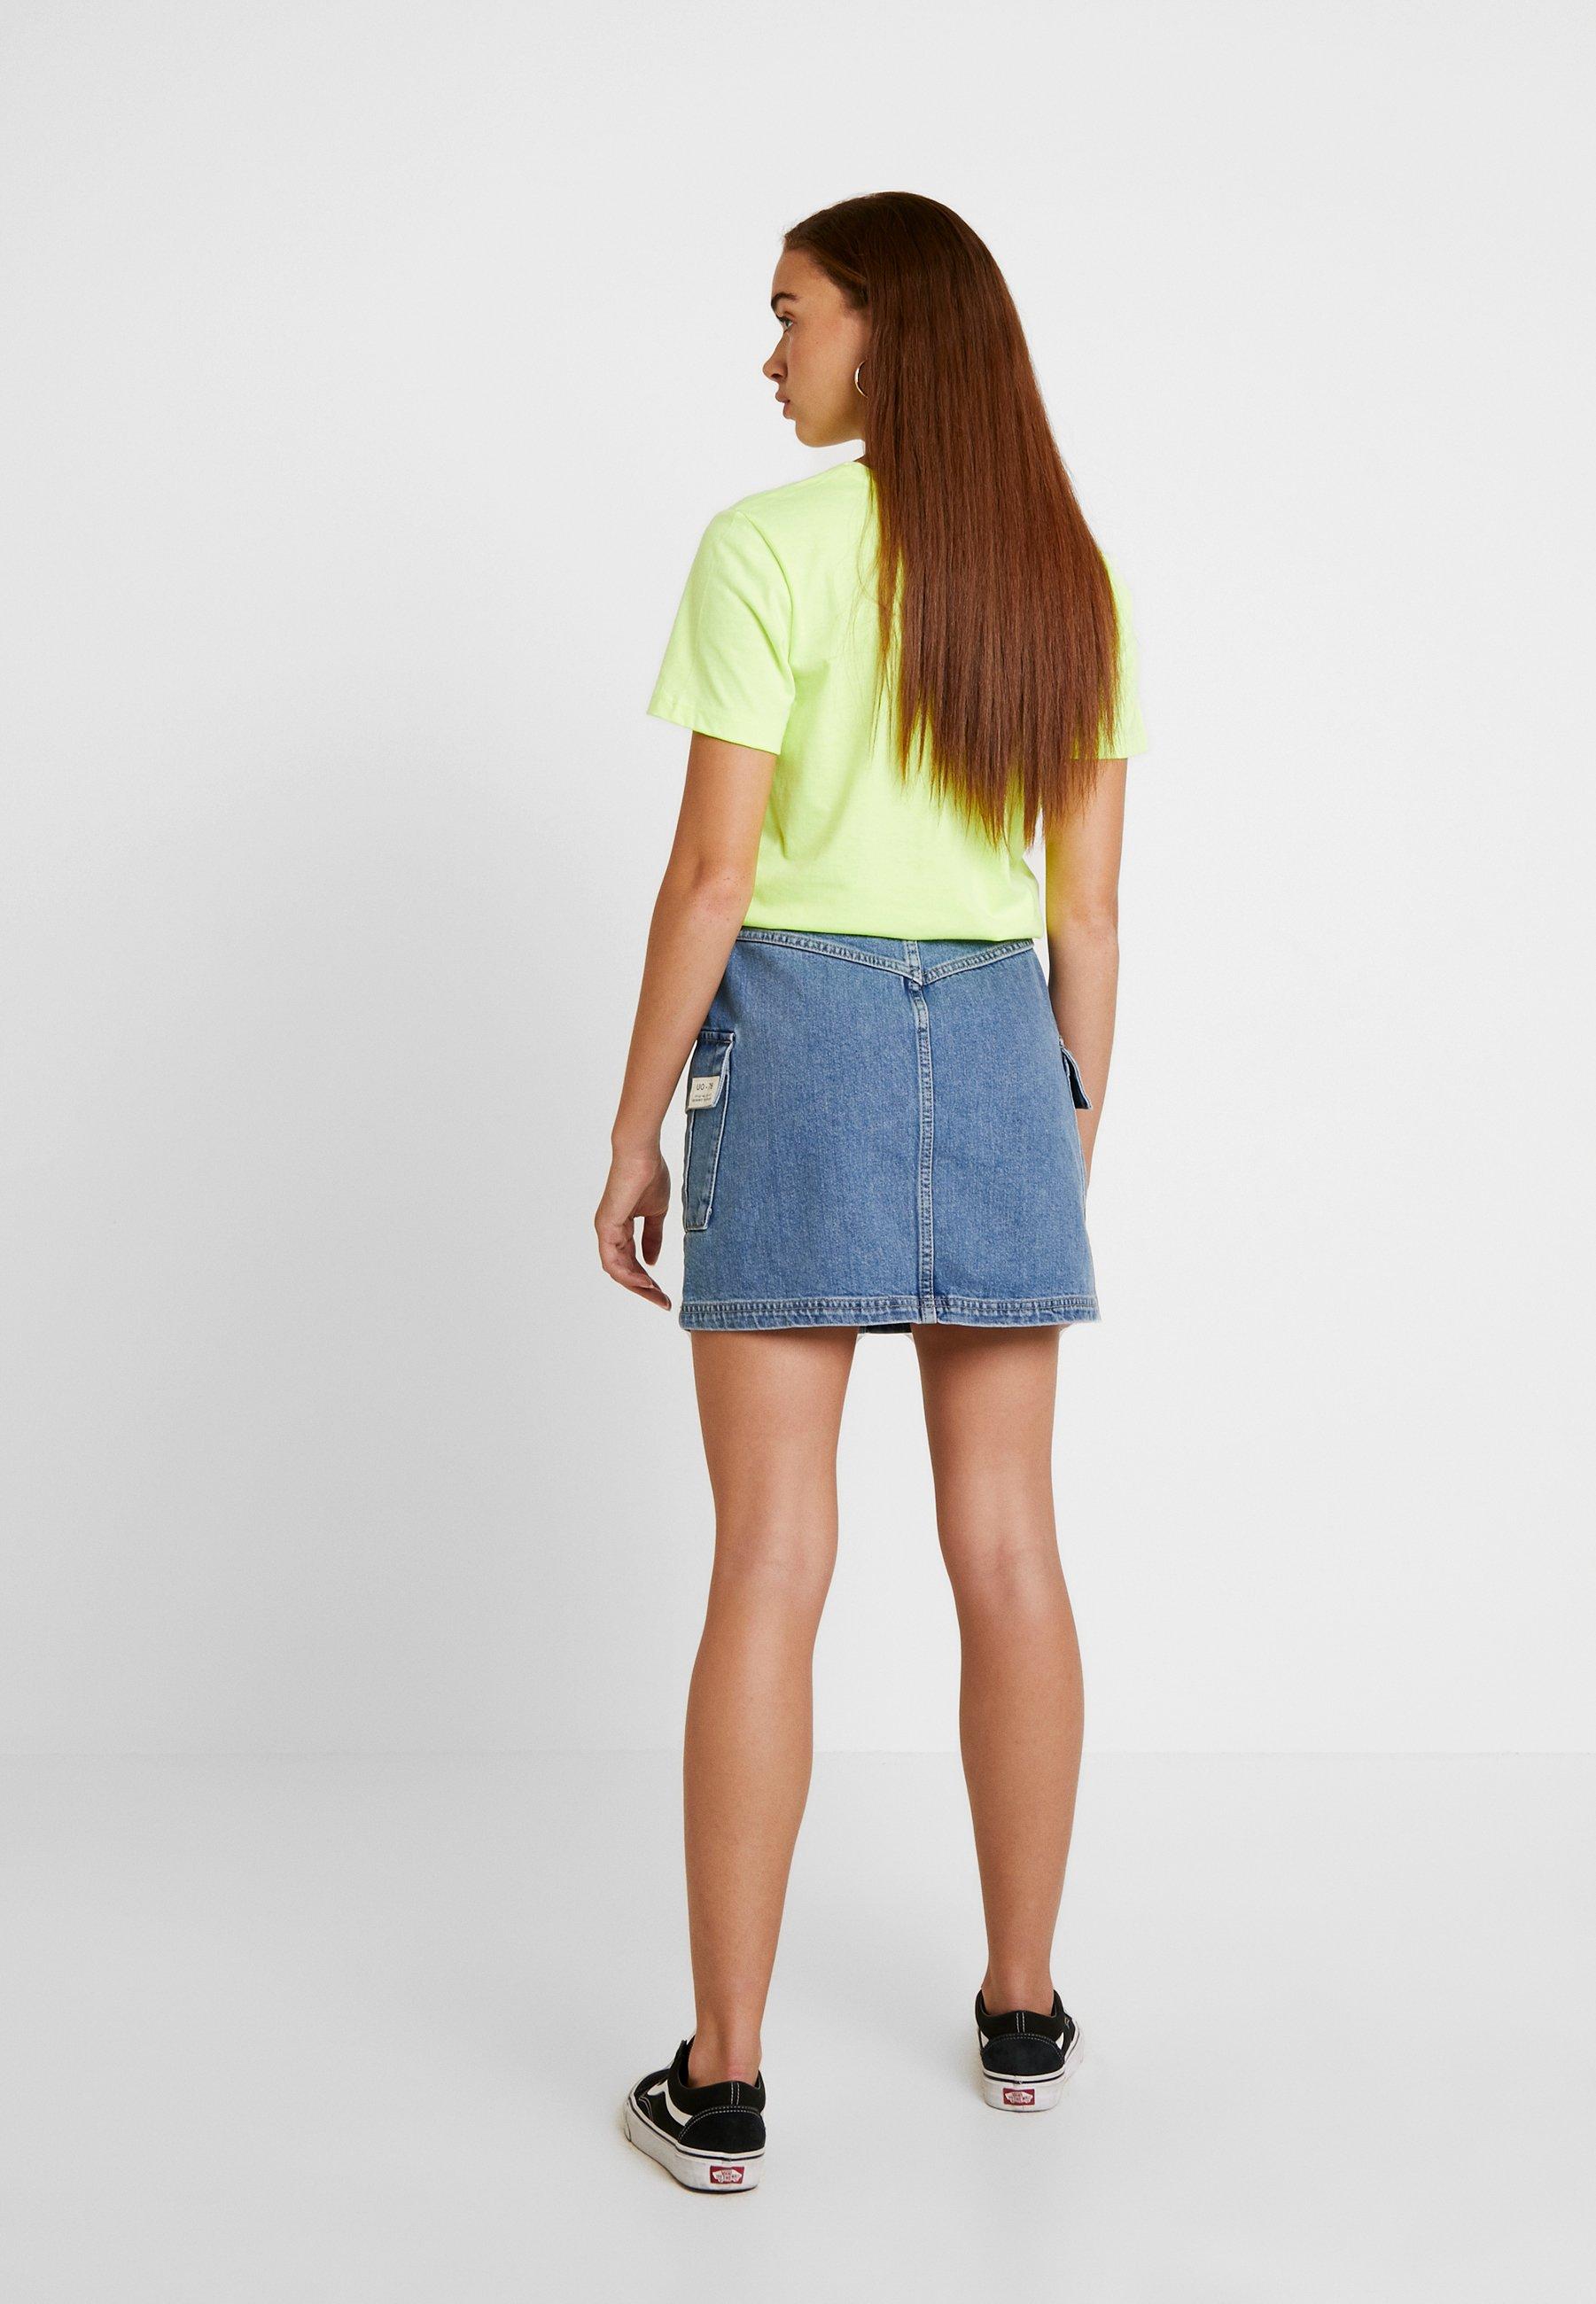 Outfitters SkirtGonna Bdg Di Cargo Bleach Urban Jeans nwOPkN8XZ0